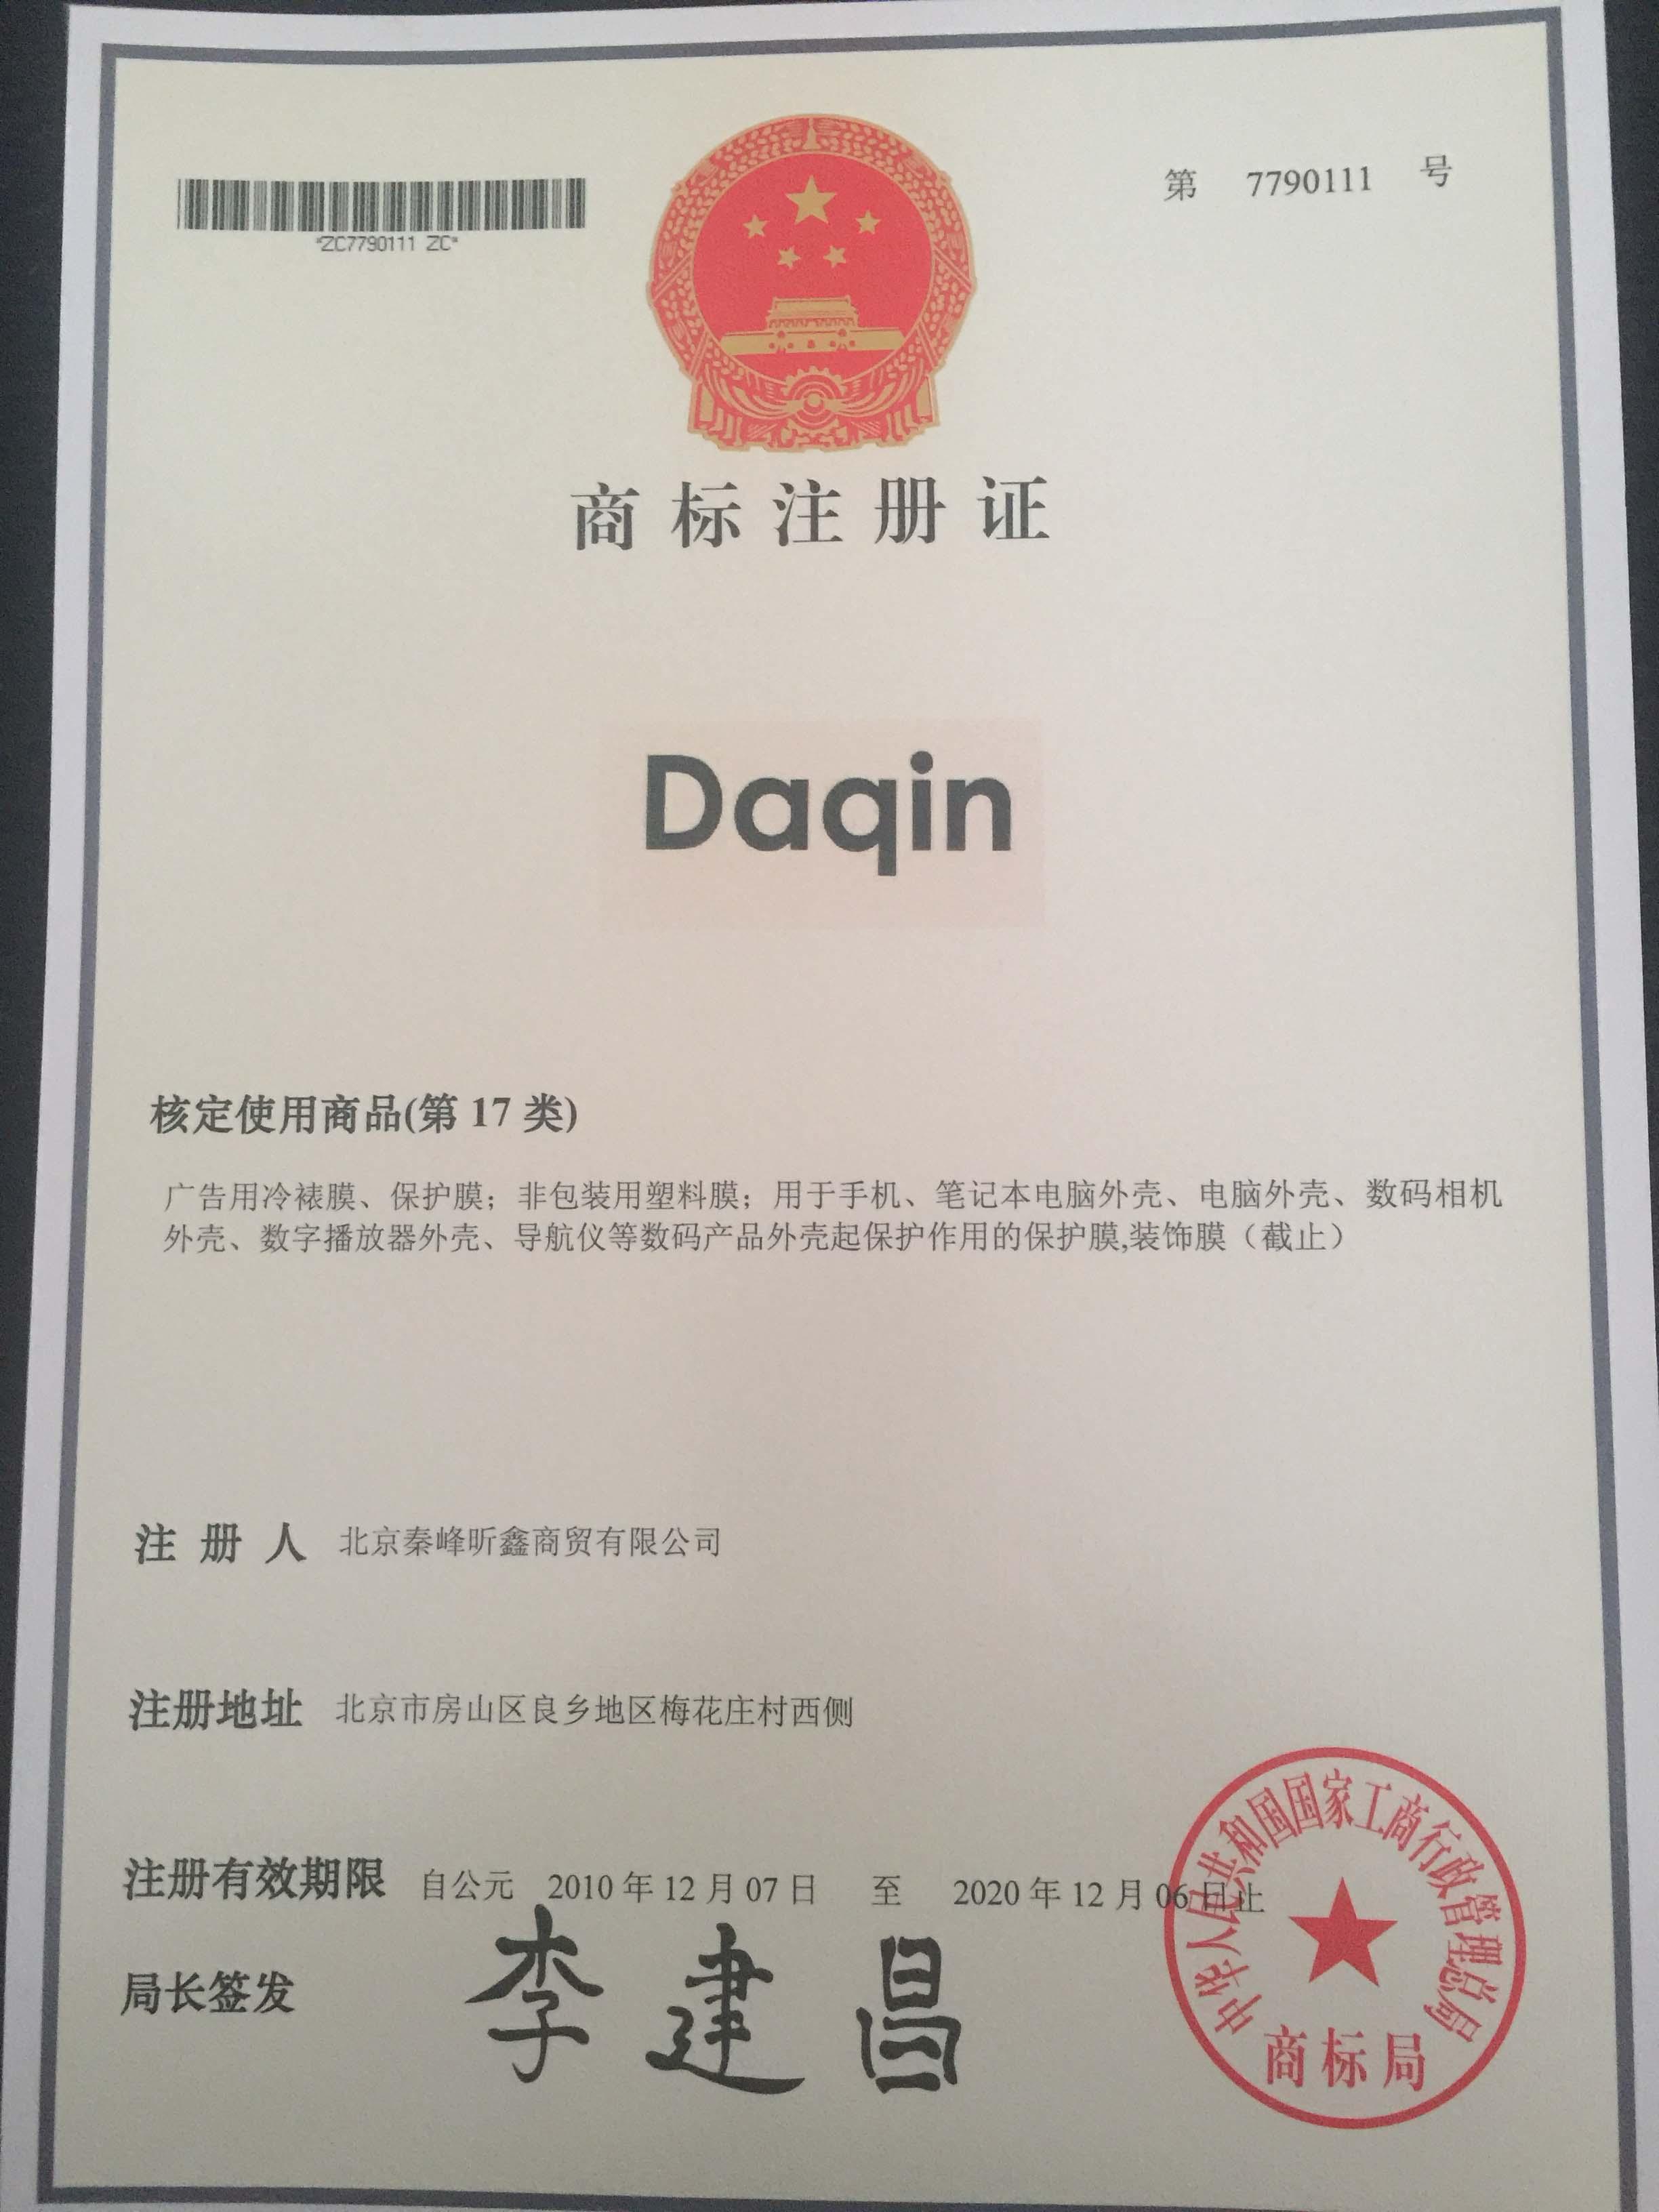 Daqin 17类商标注册证